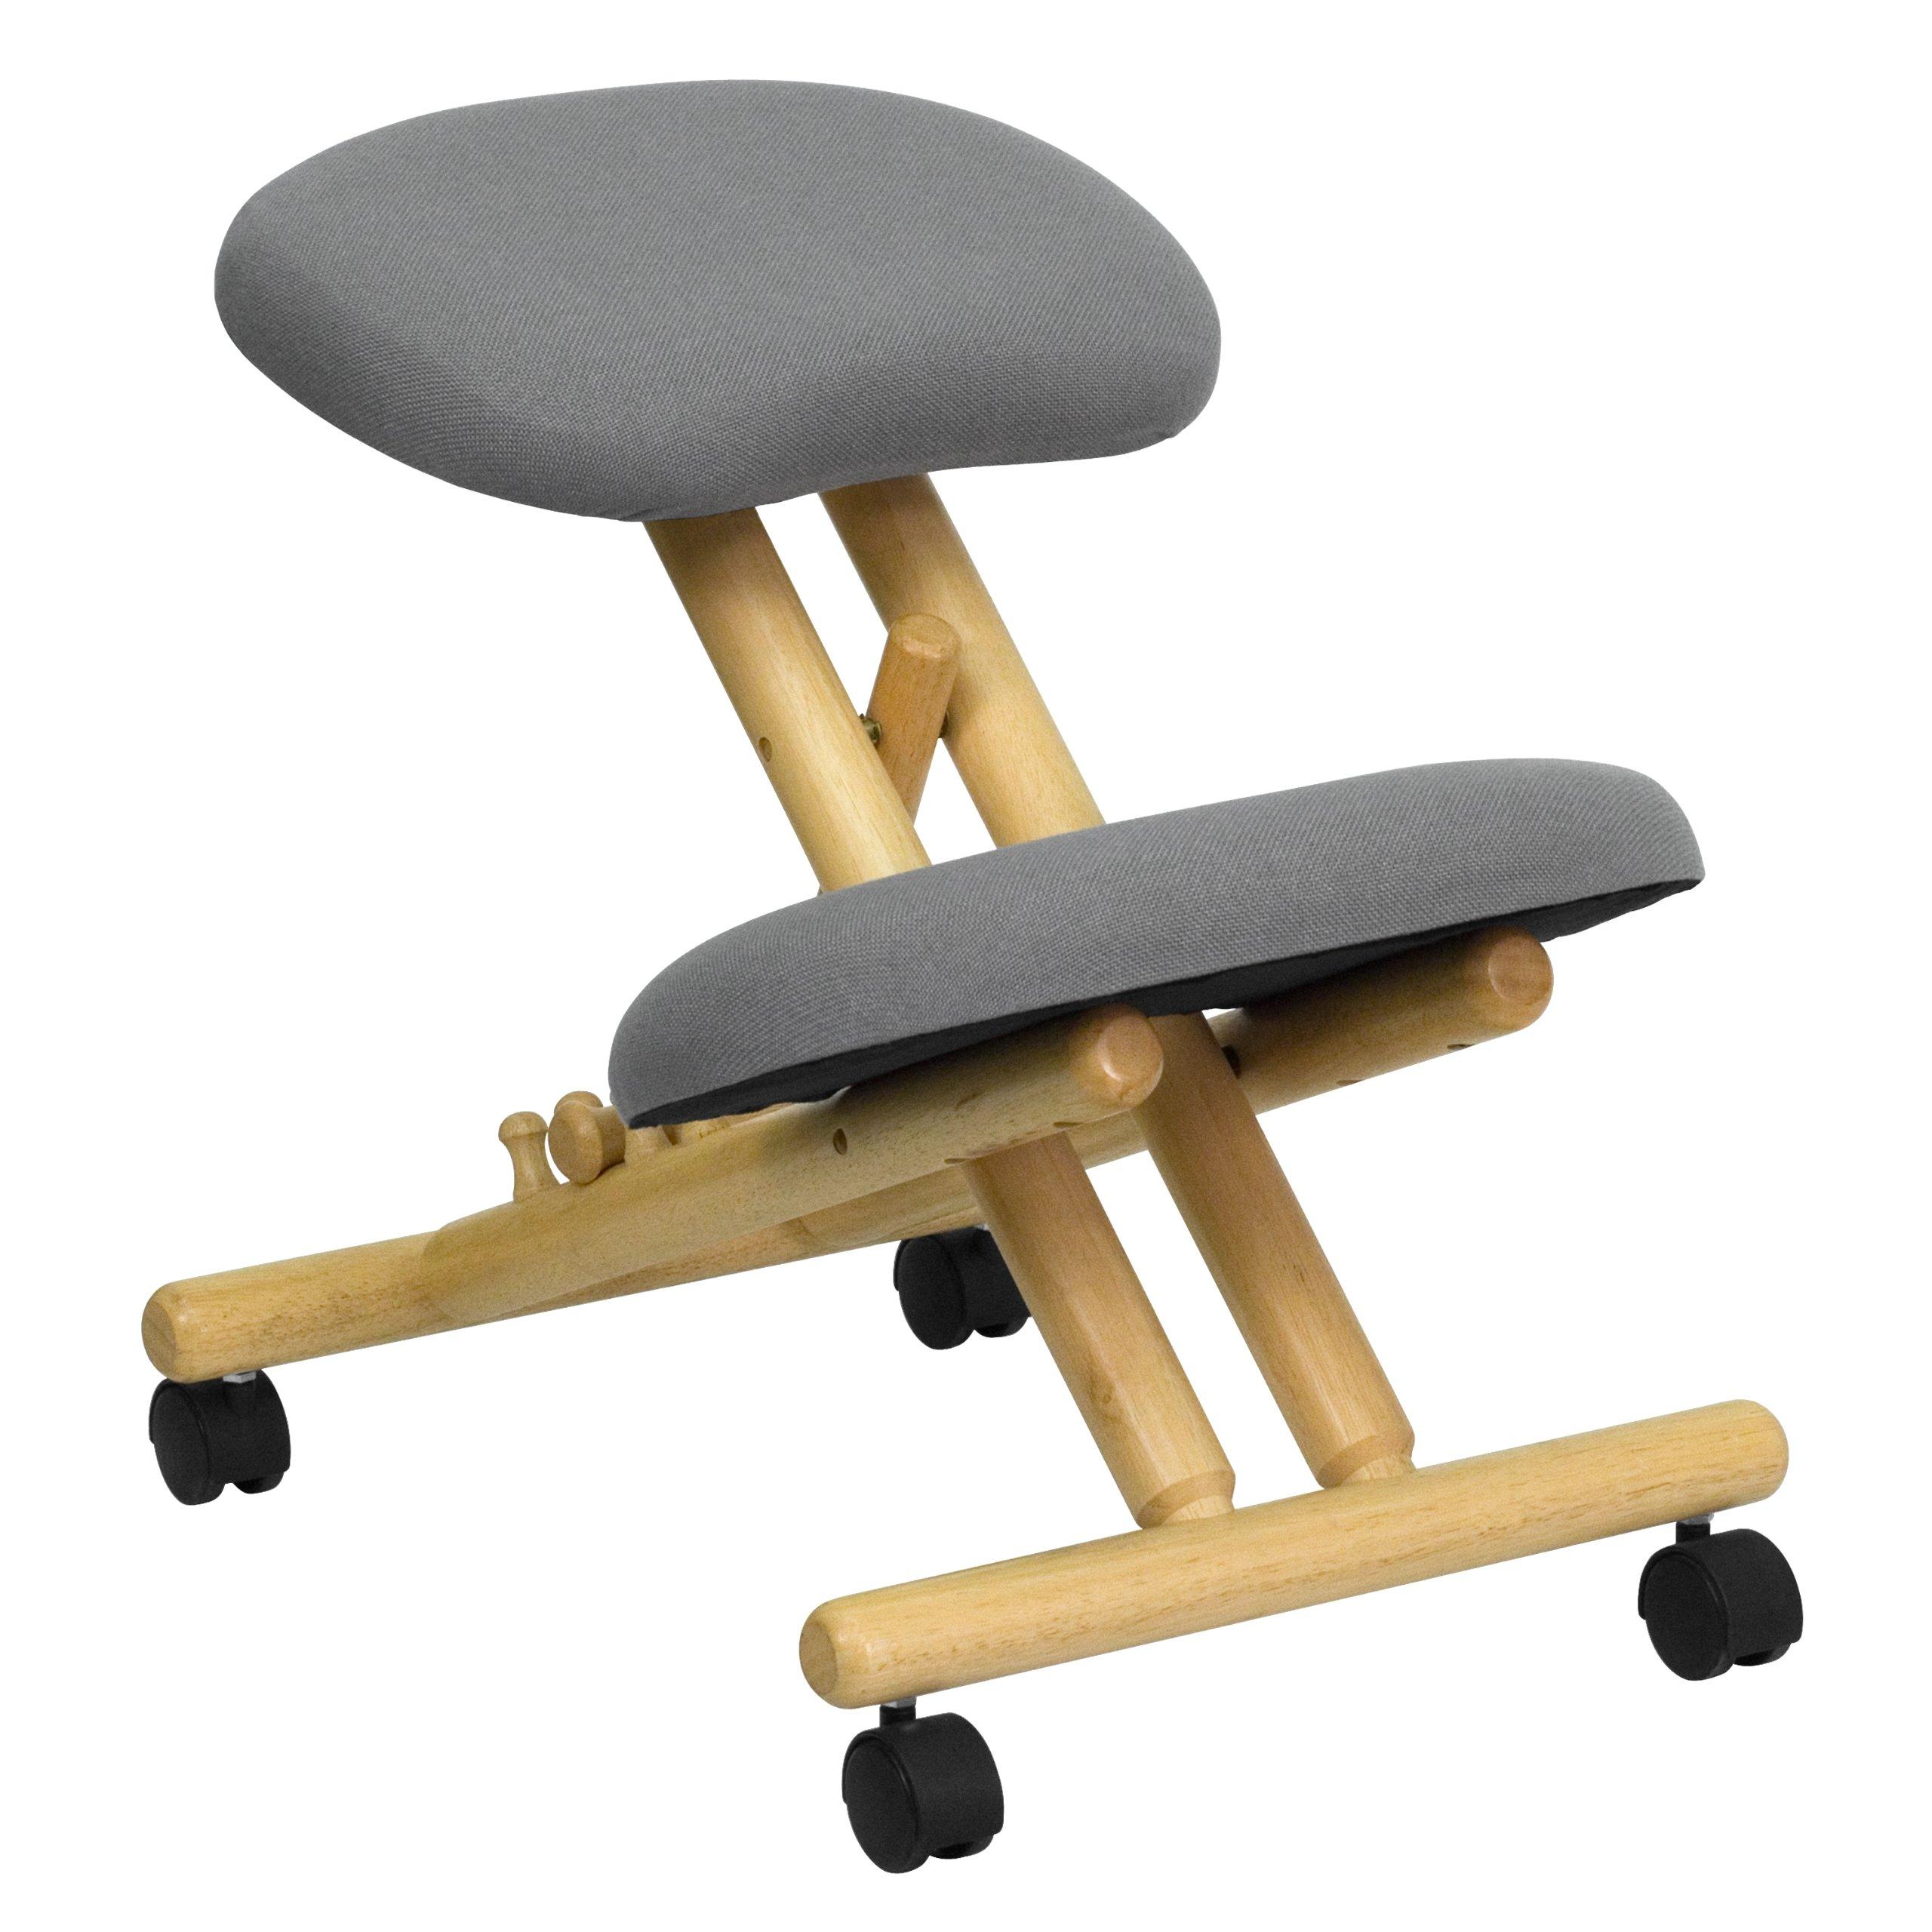 Flash Furniture Wooden Ergonomic Kneeling Posture Office Chair, Gray, WL-SB-101-GG by Flash Furniture